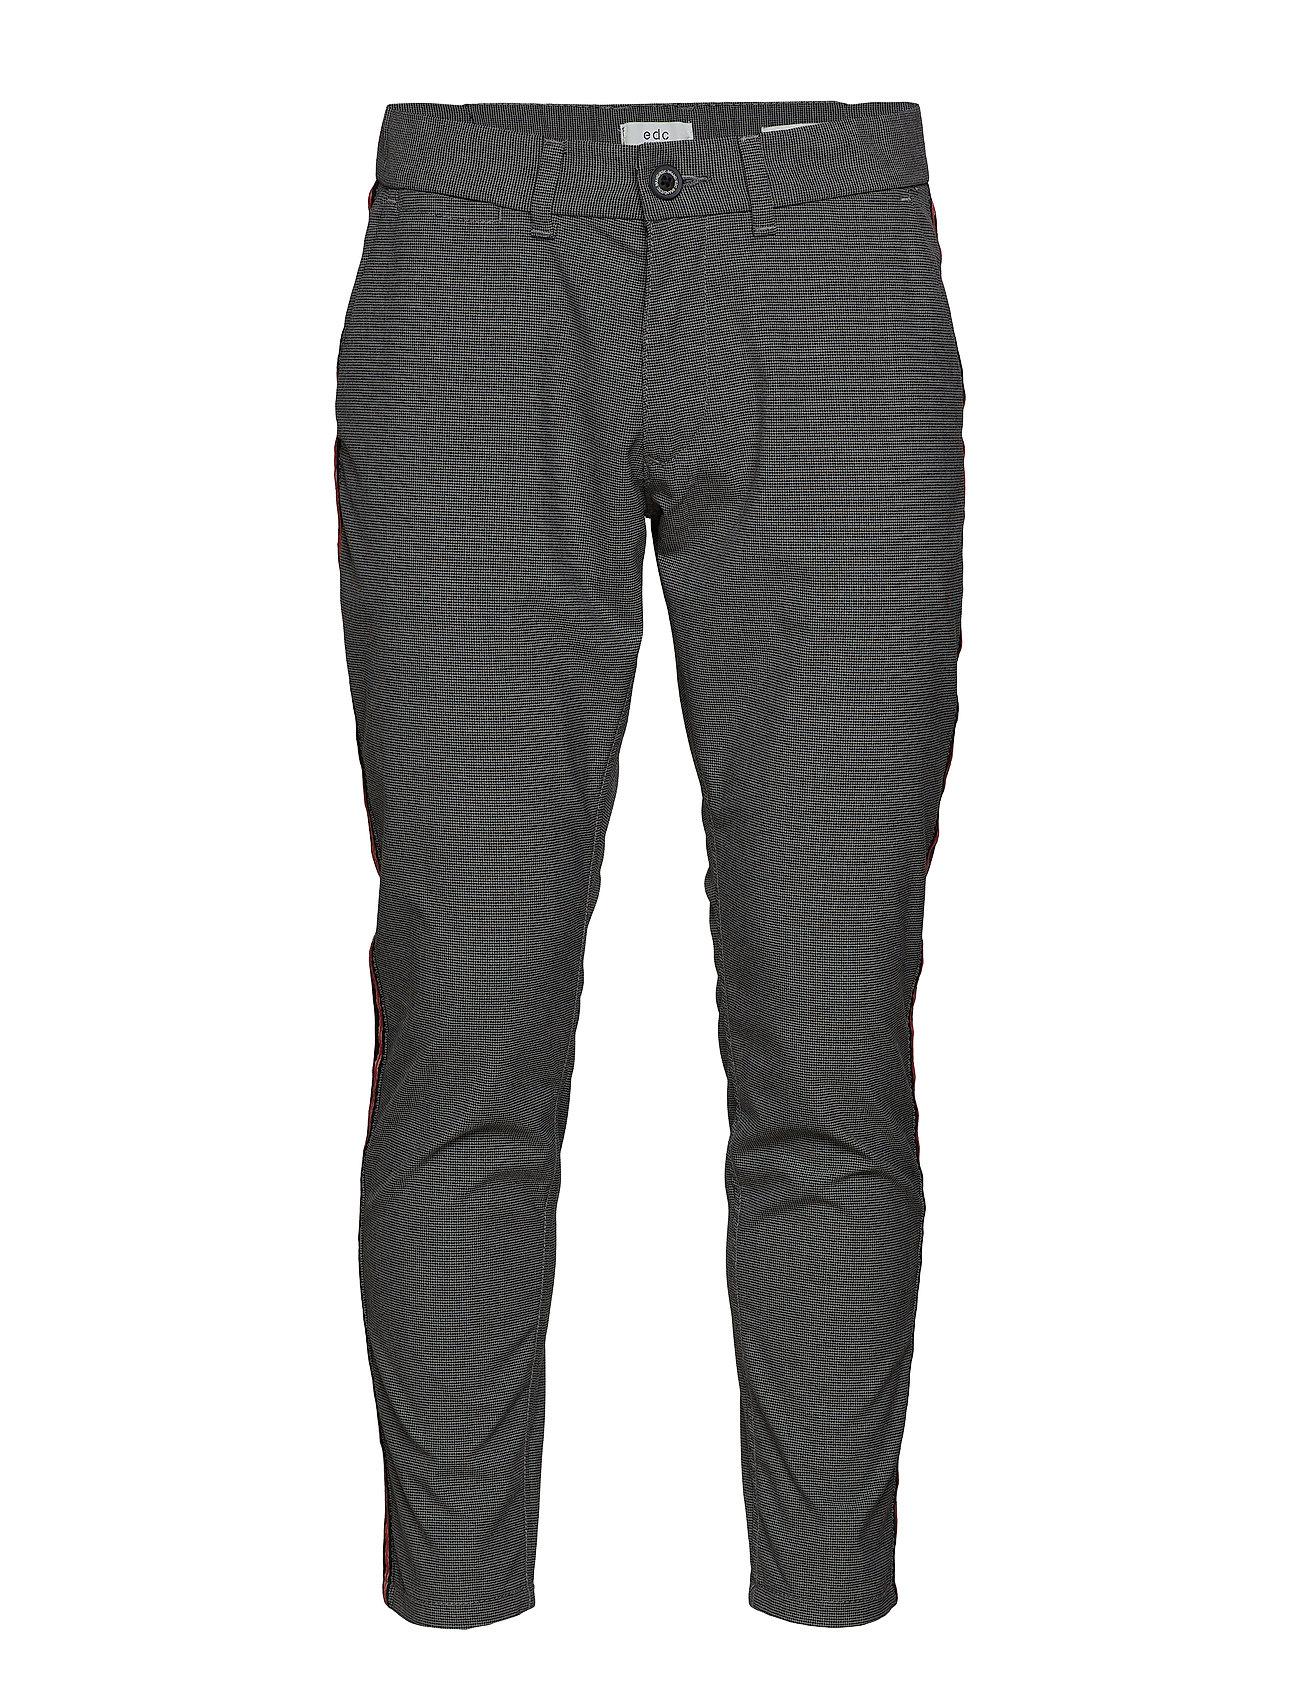 Pants Woven Chinos Bukser Grå EDC BY ESPRIT